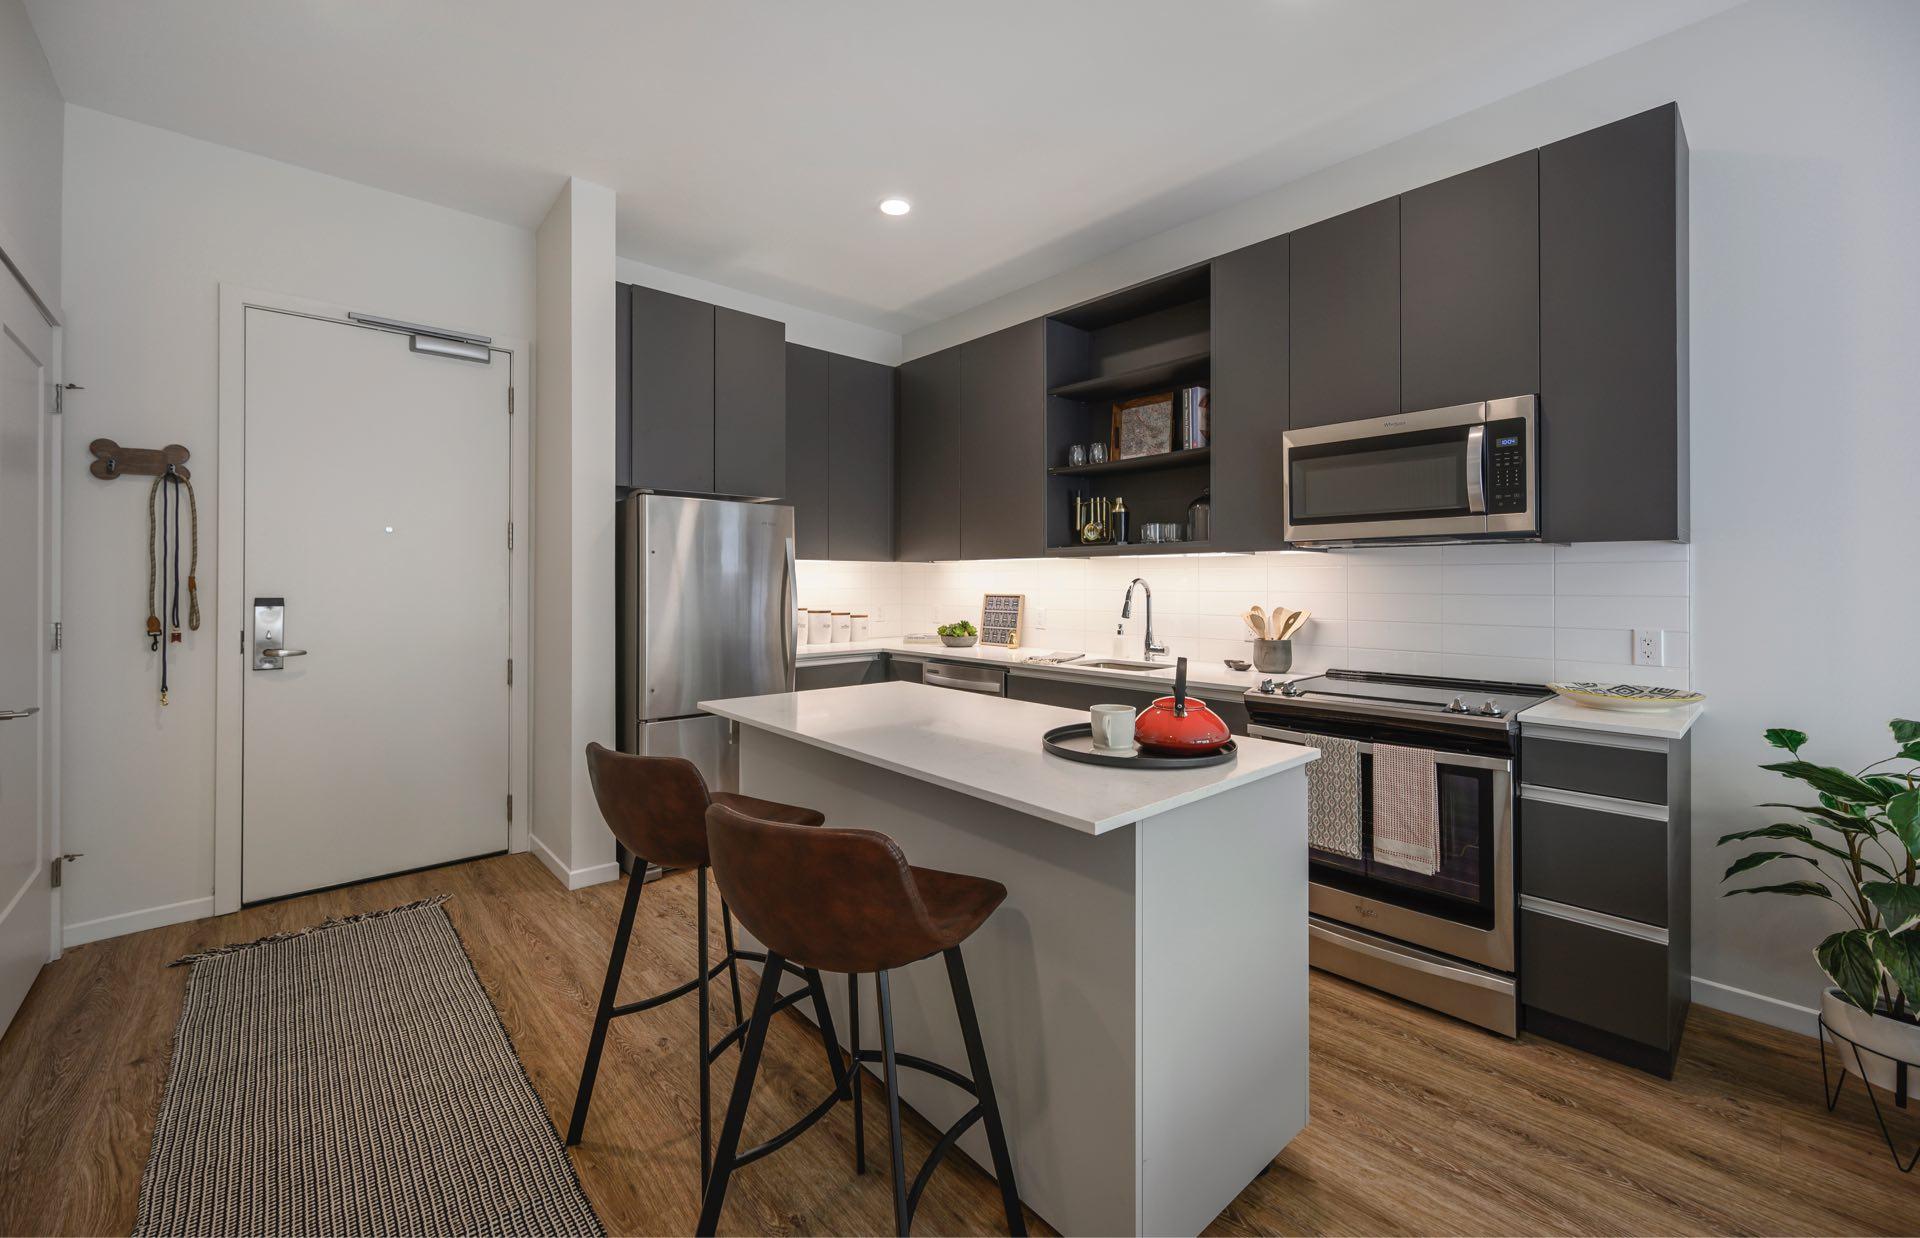 Apartments img 4